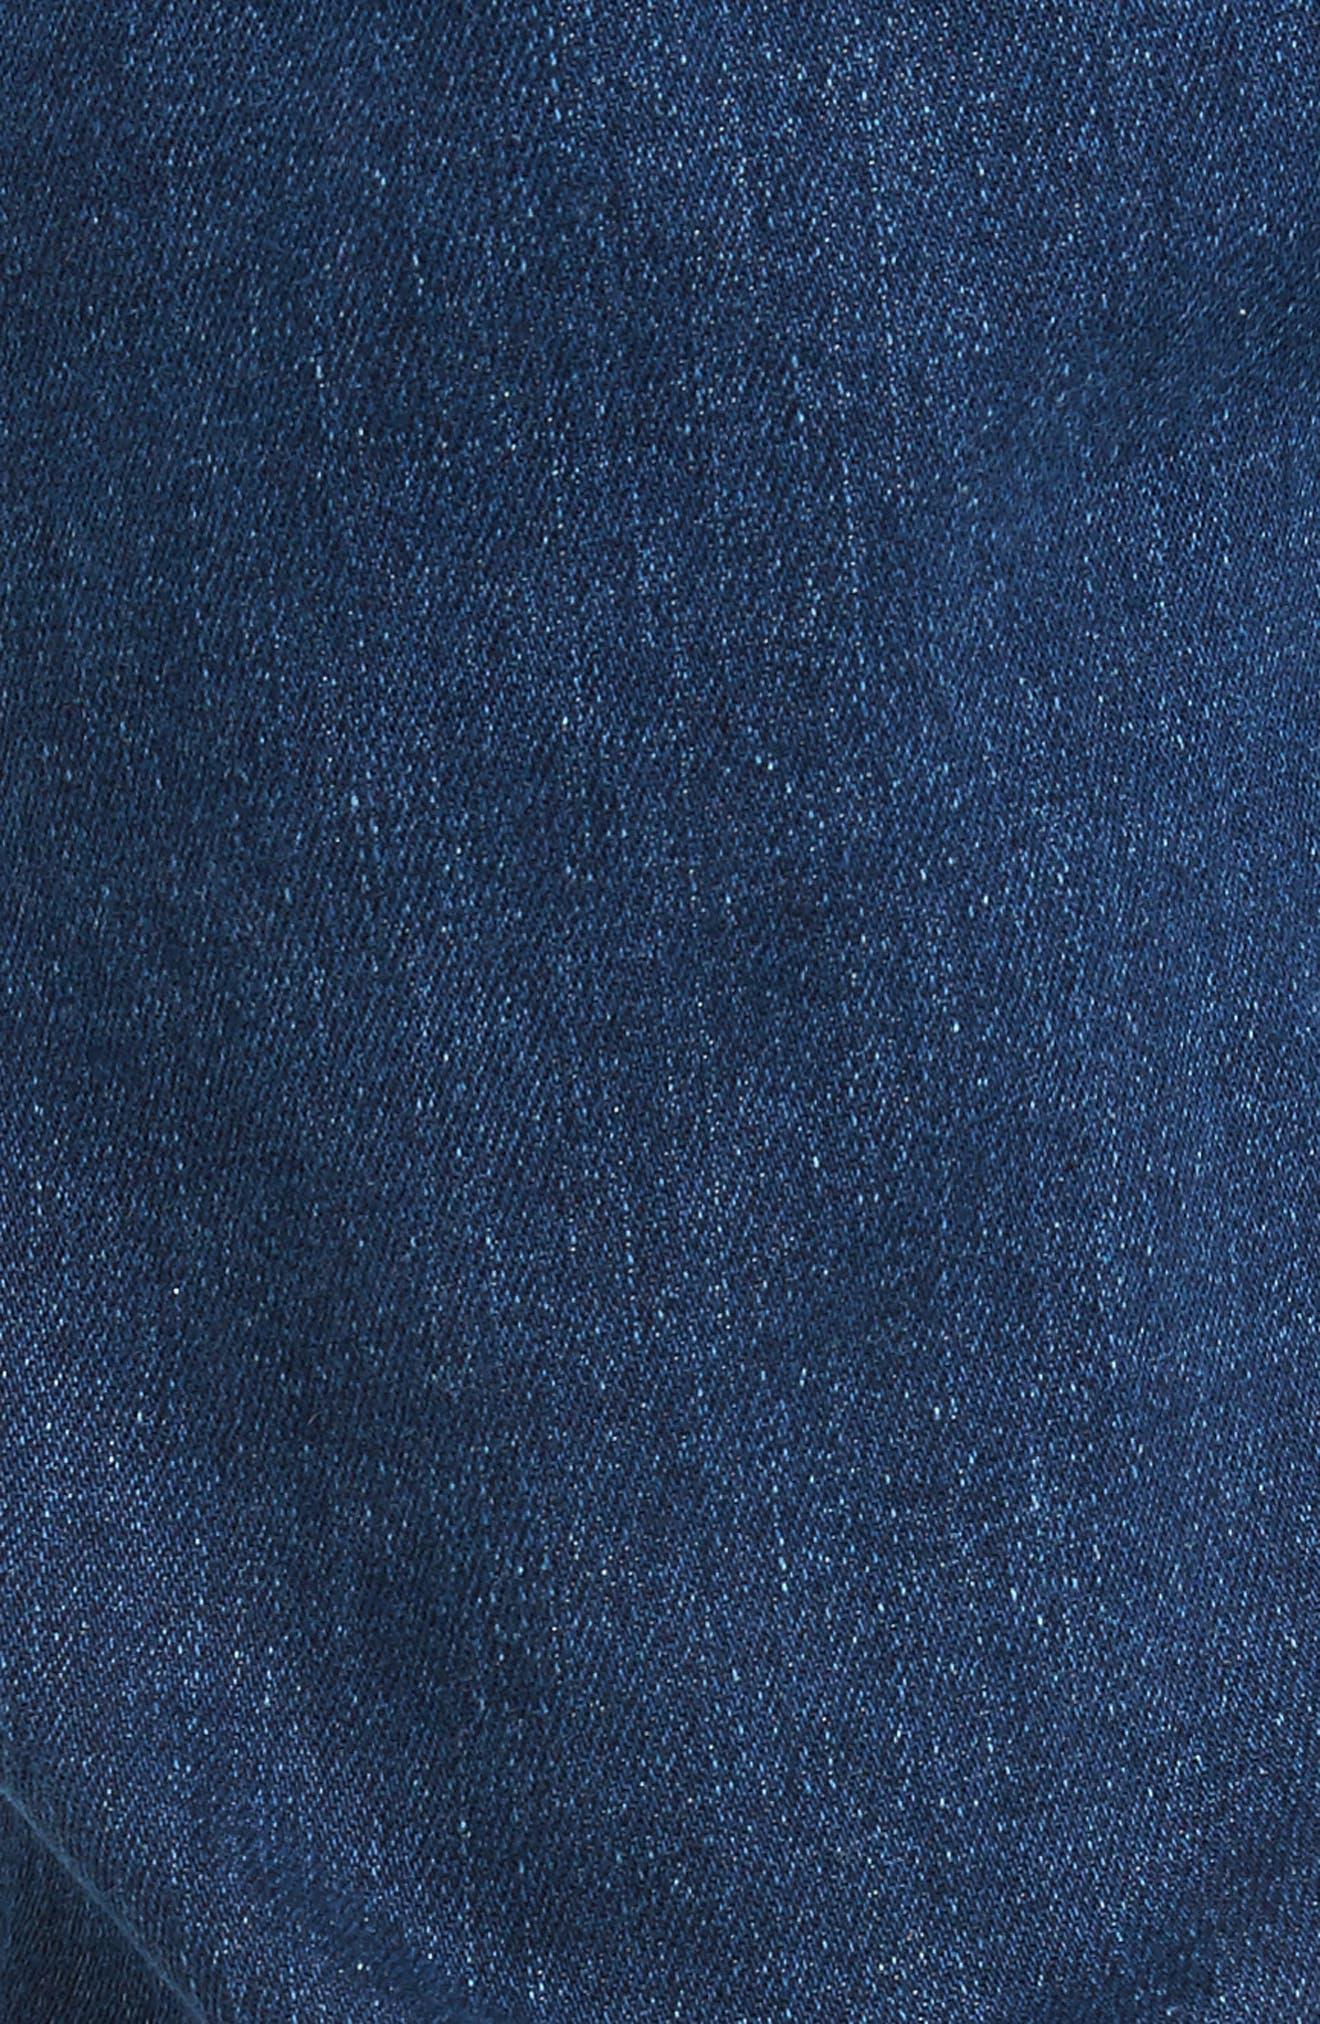 Clark Slim Straight Leg Jeans,                             Alternate thumbnail 5, color,                             Mid Retro